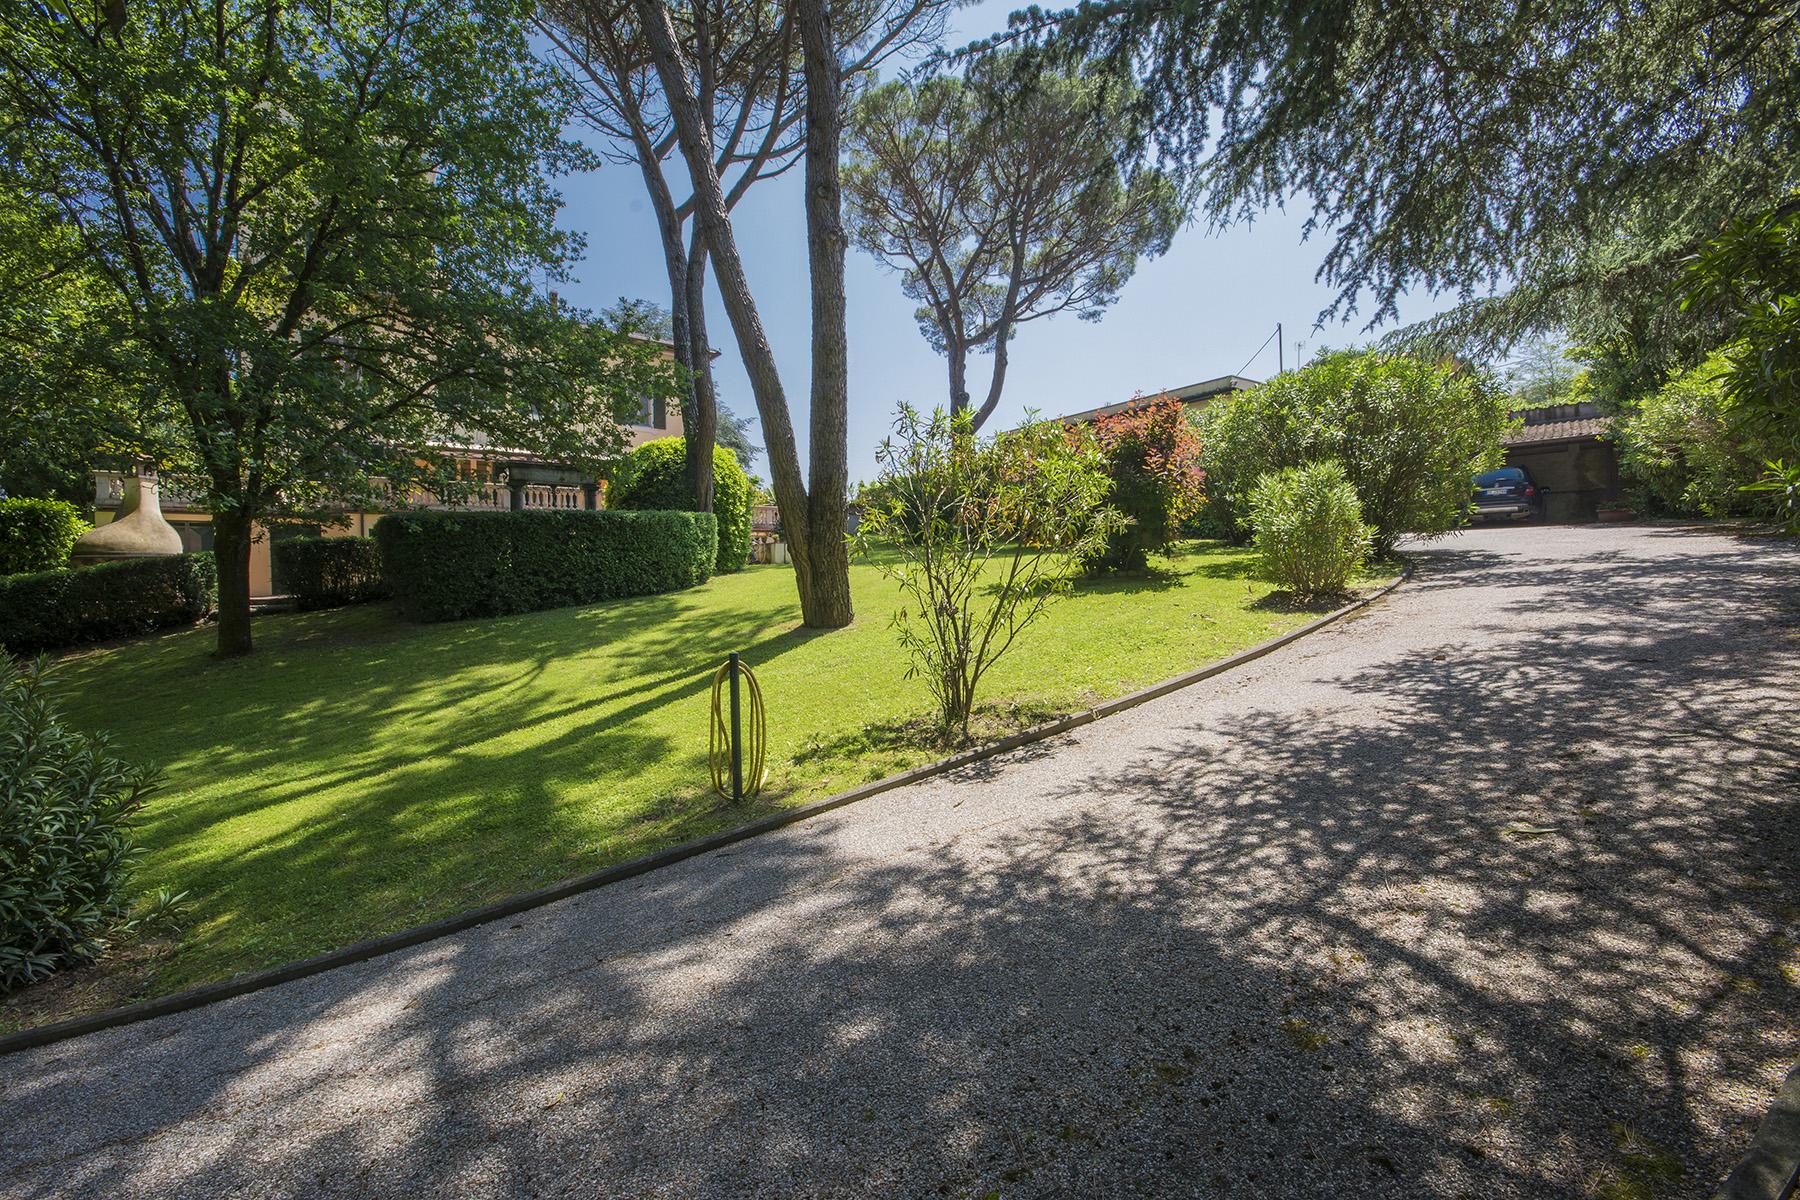 Villa in Vendita a Lucca: 5 locali, 760 mq - Foto 2